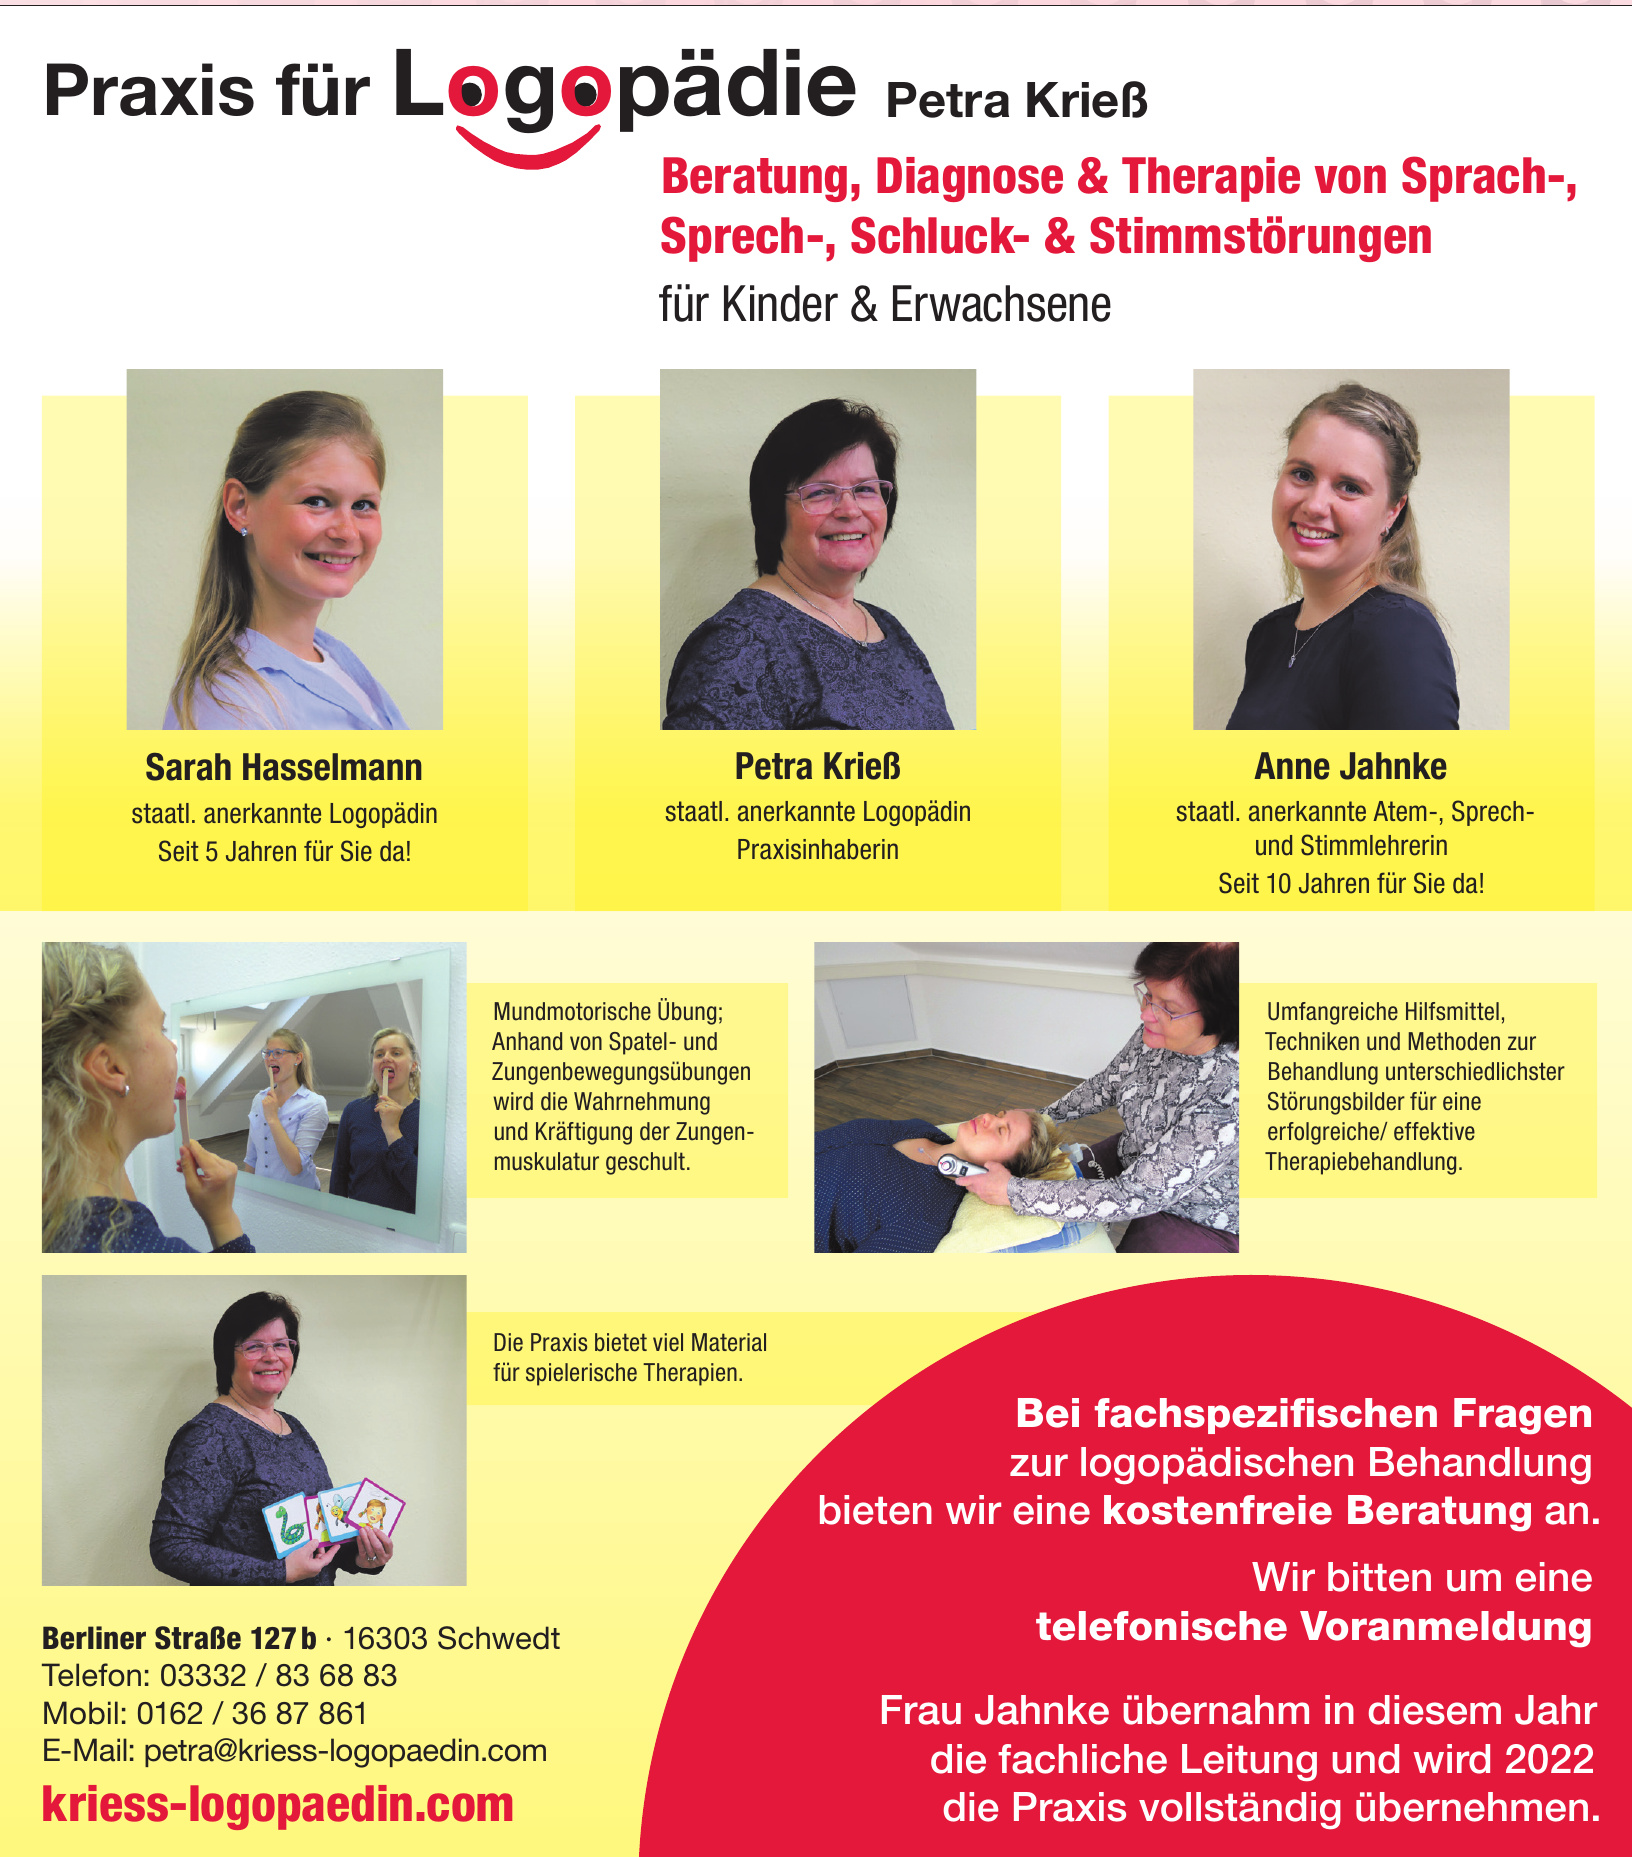 Praxis für Logopädie Petra Krieß